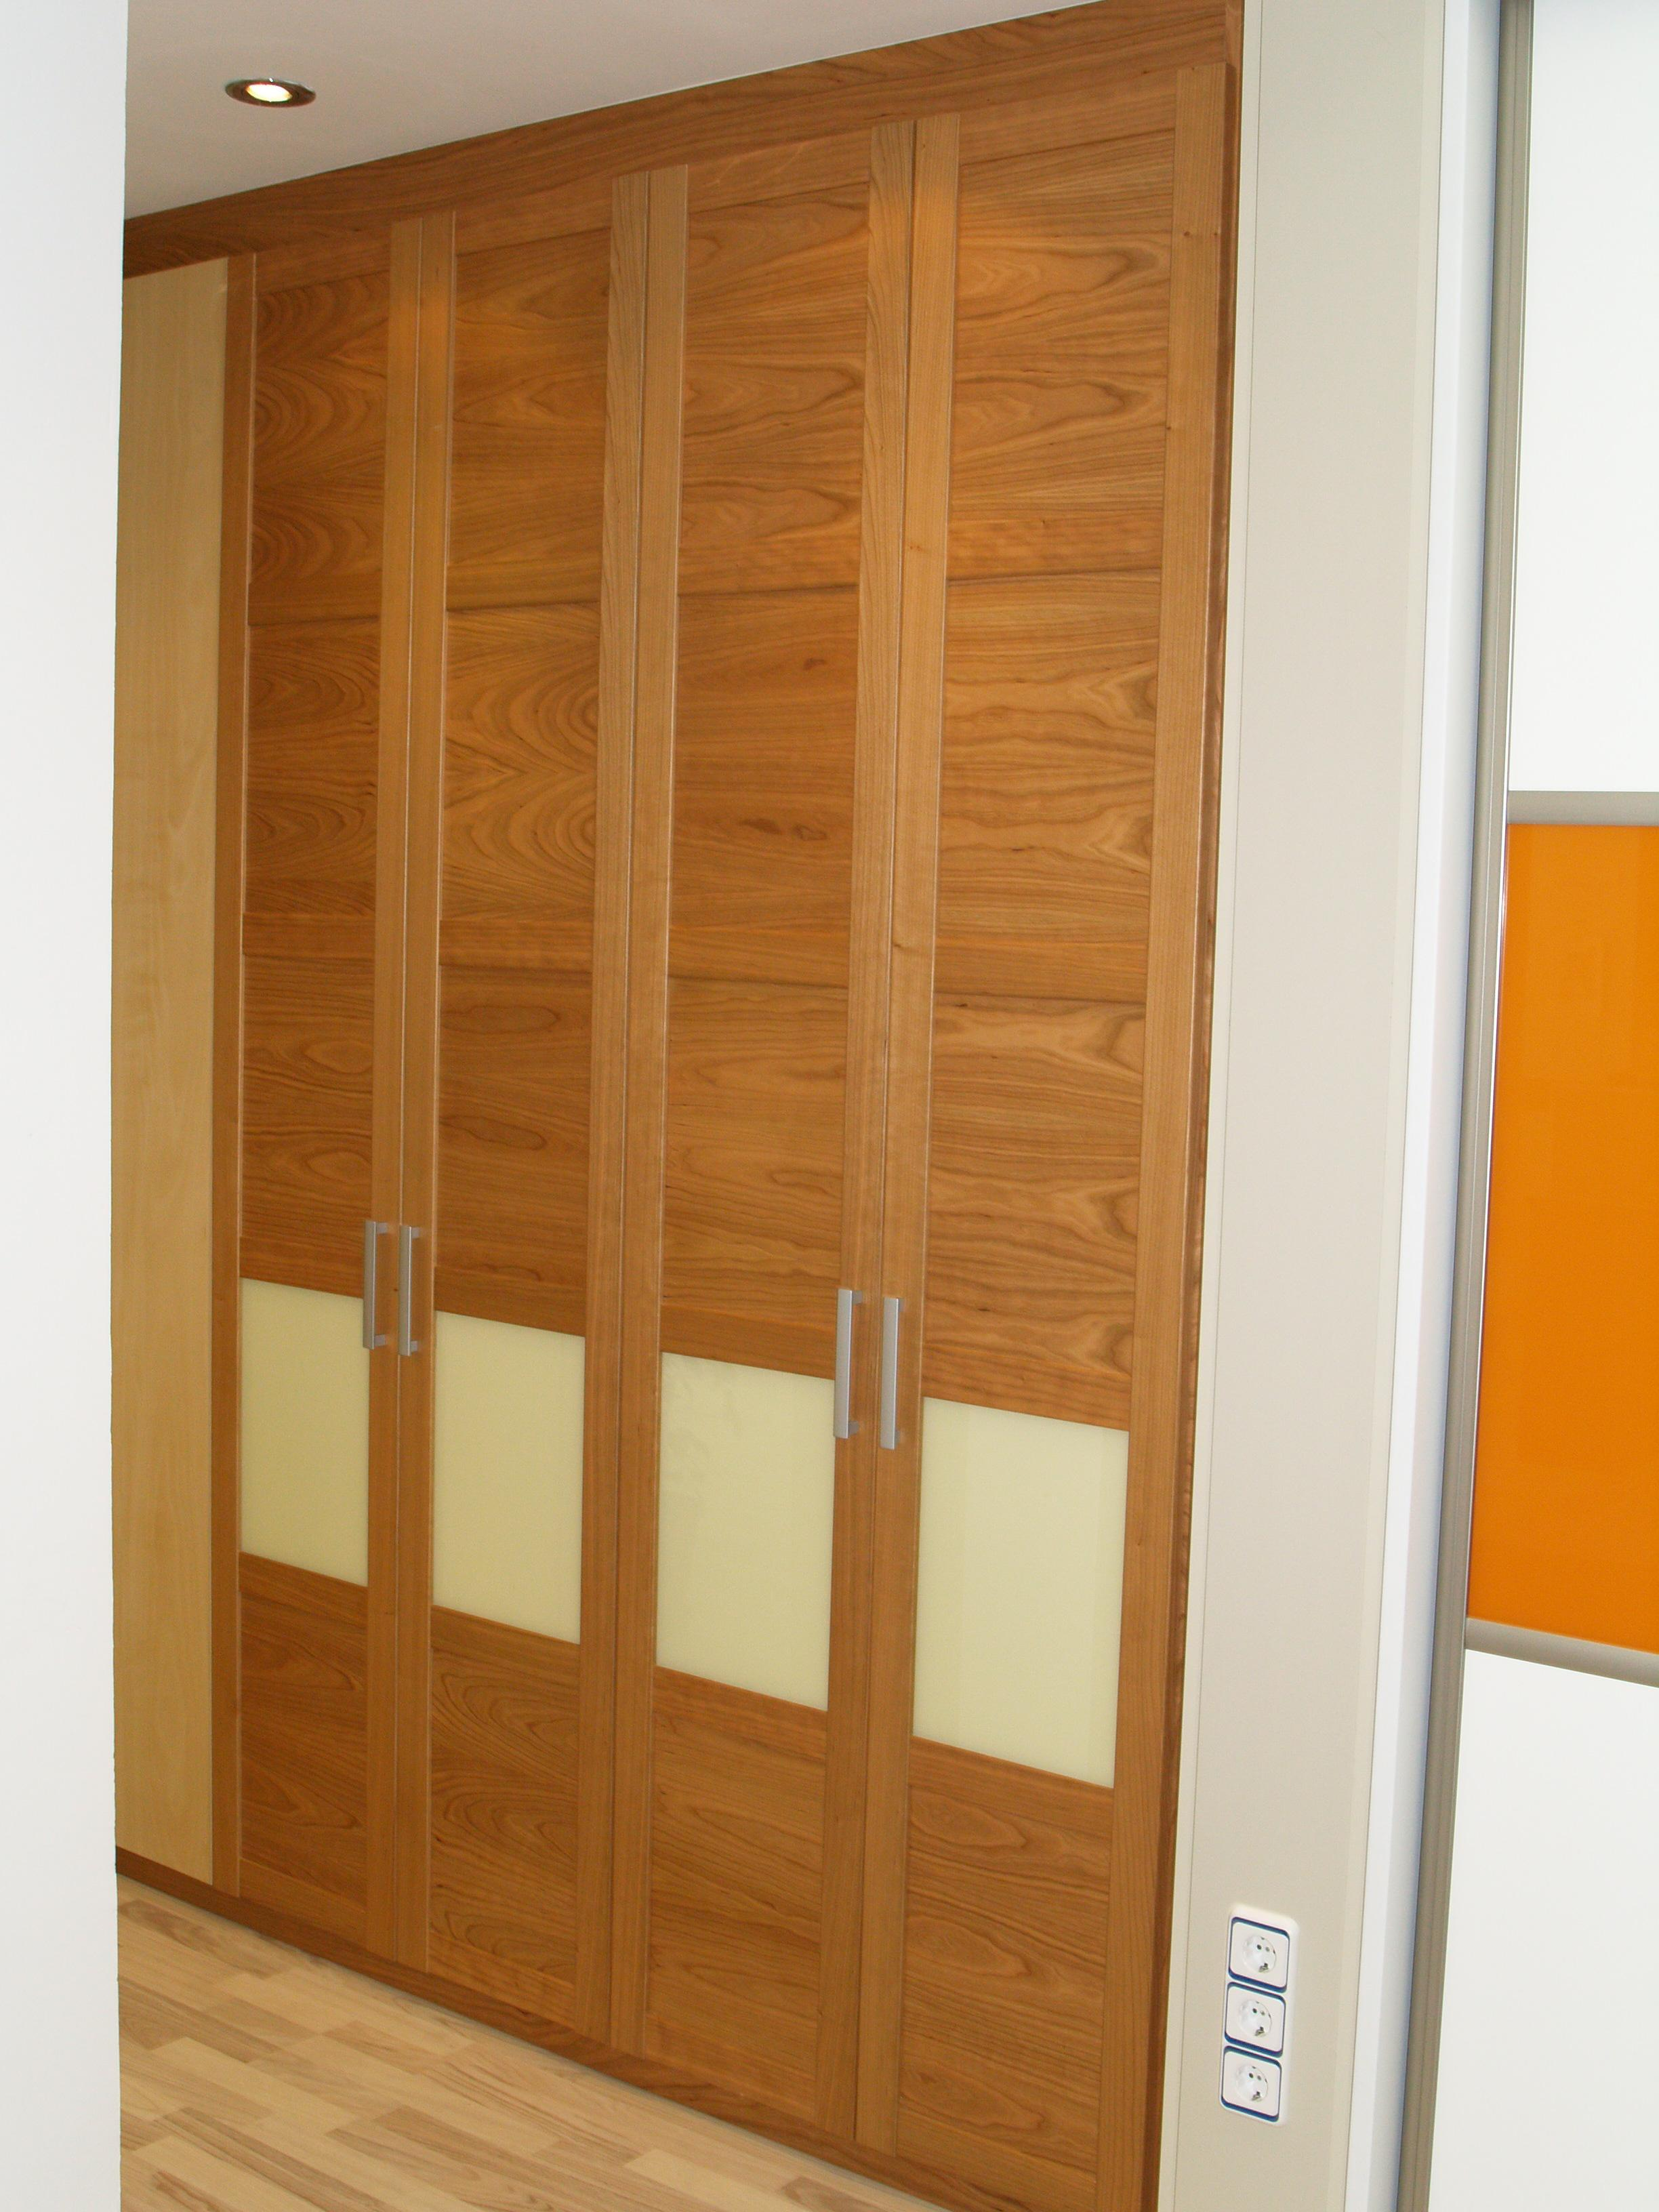 Armarios empotrados con puertas correderas o abatibles - Puertas correderas de armarios empotrados ...